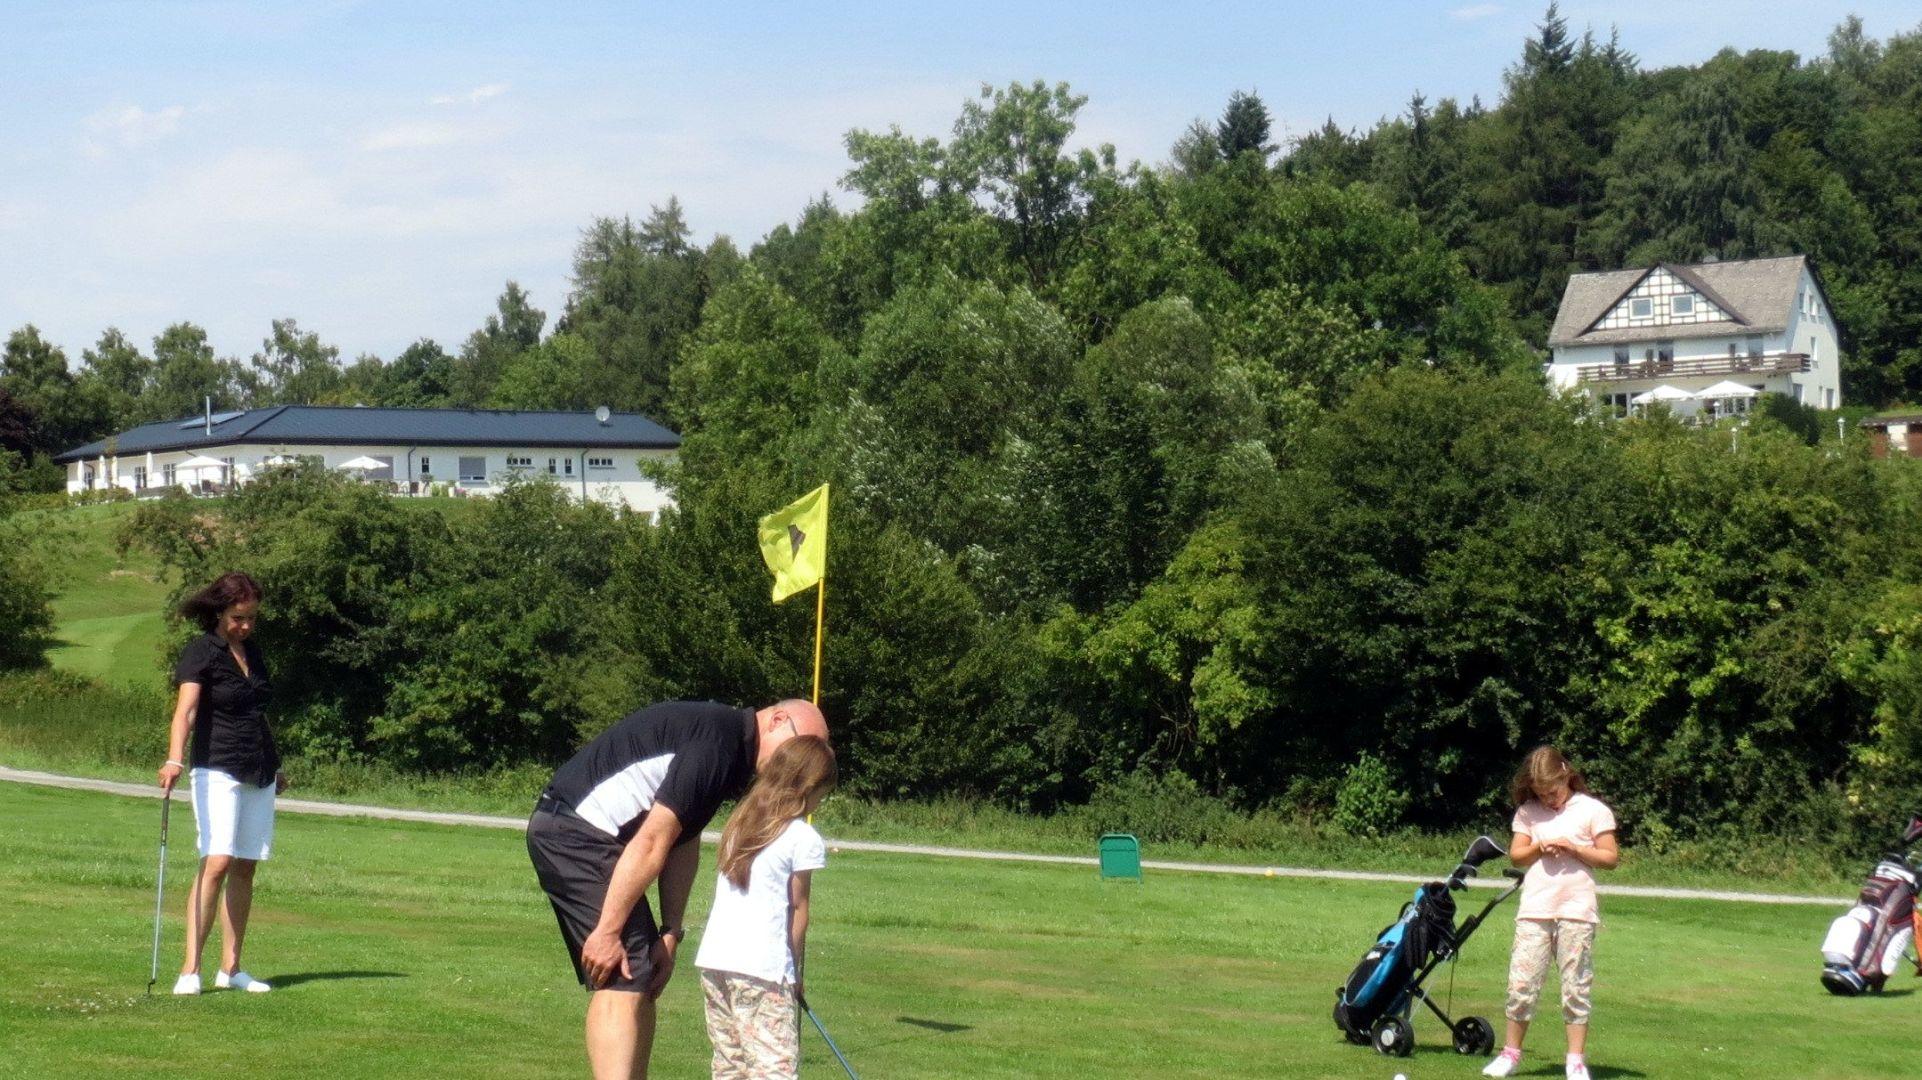 Golfplatz in Brilon